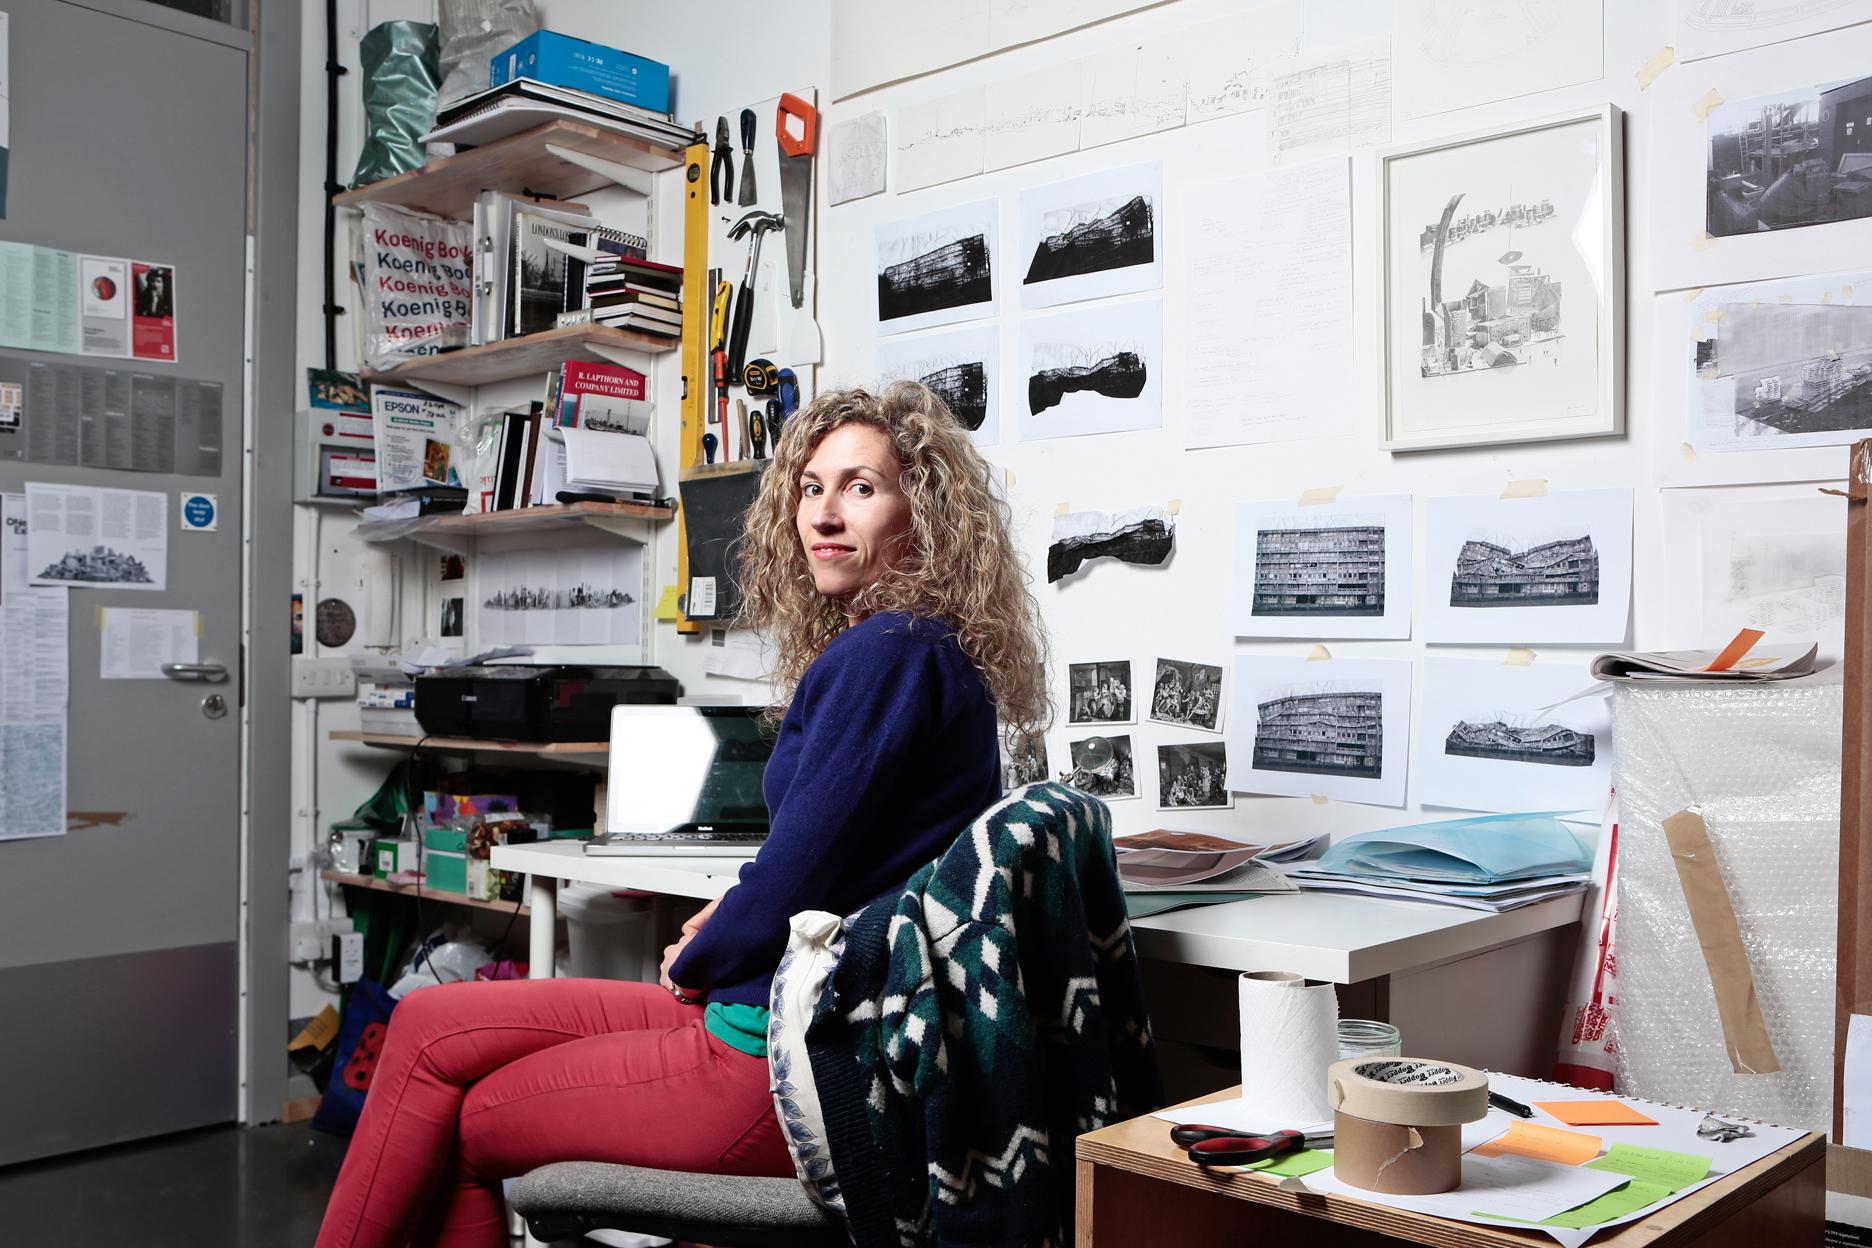 Jessie Brennan in herstudio, 2014, Image Credit: Patrick Marks assisted by Max Mudie